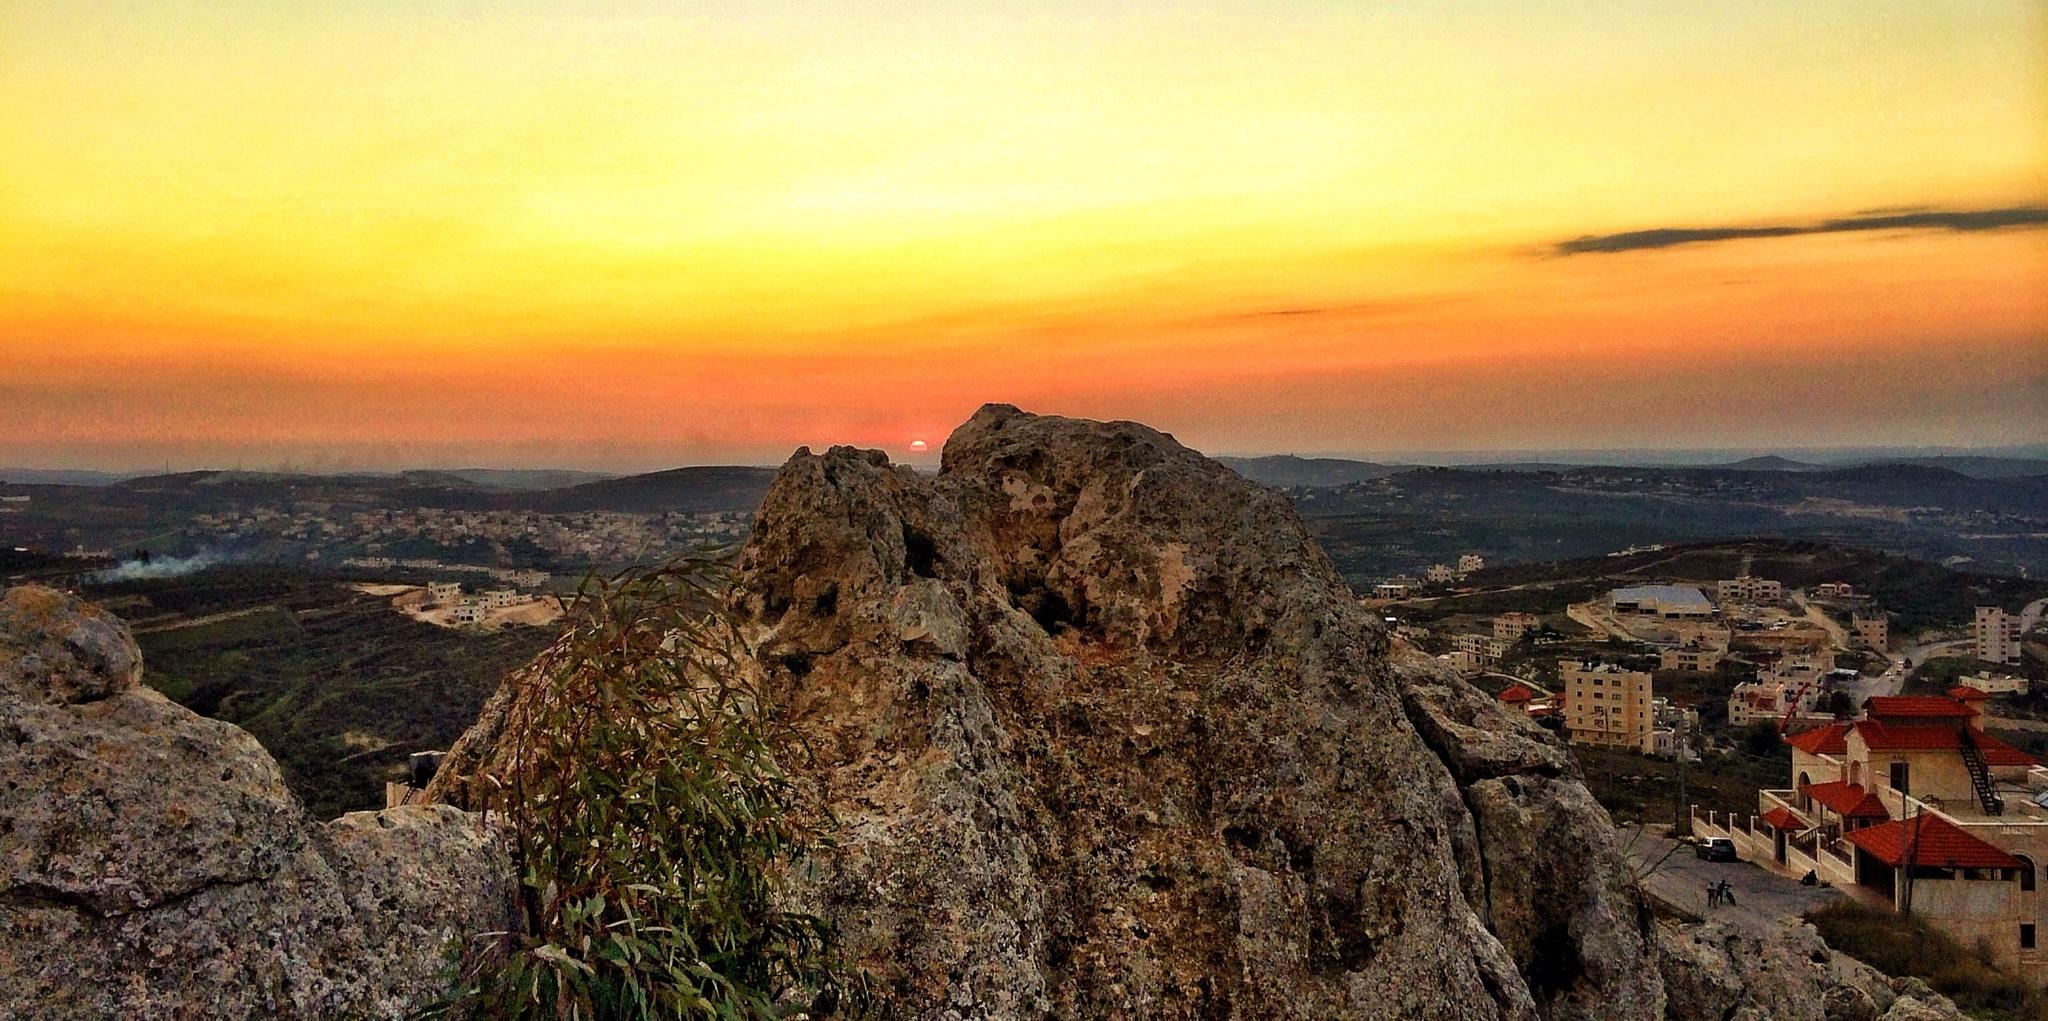 Sunrise by Hani_Yousef